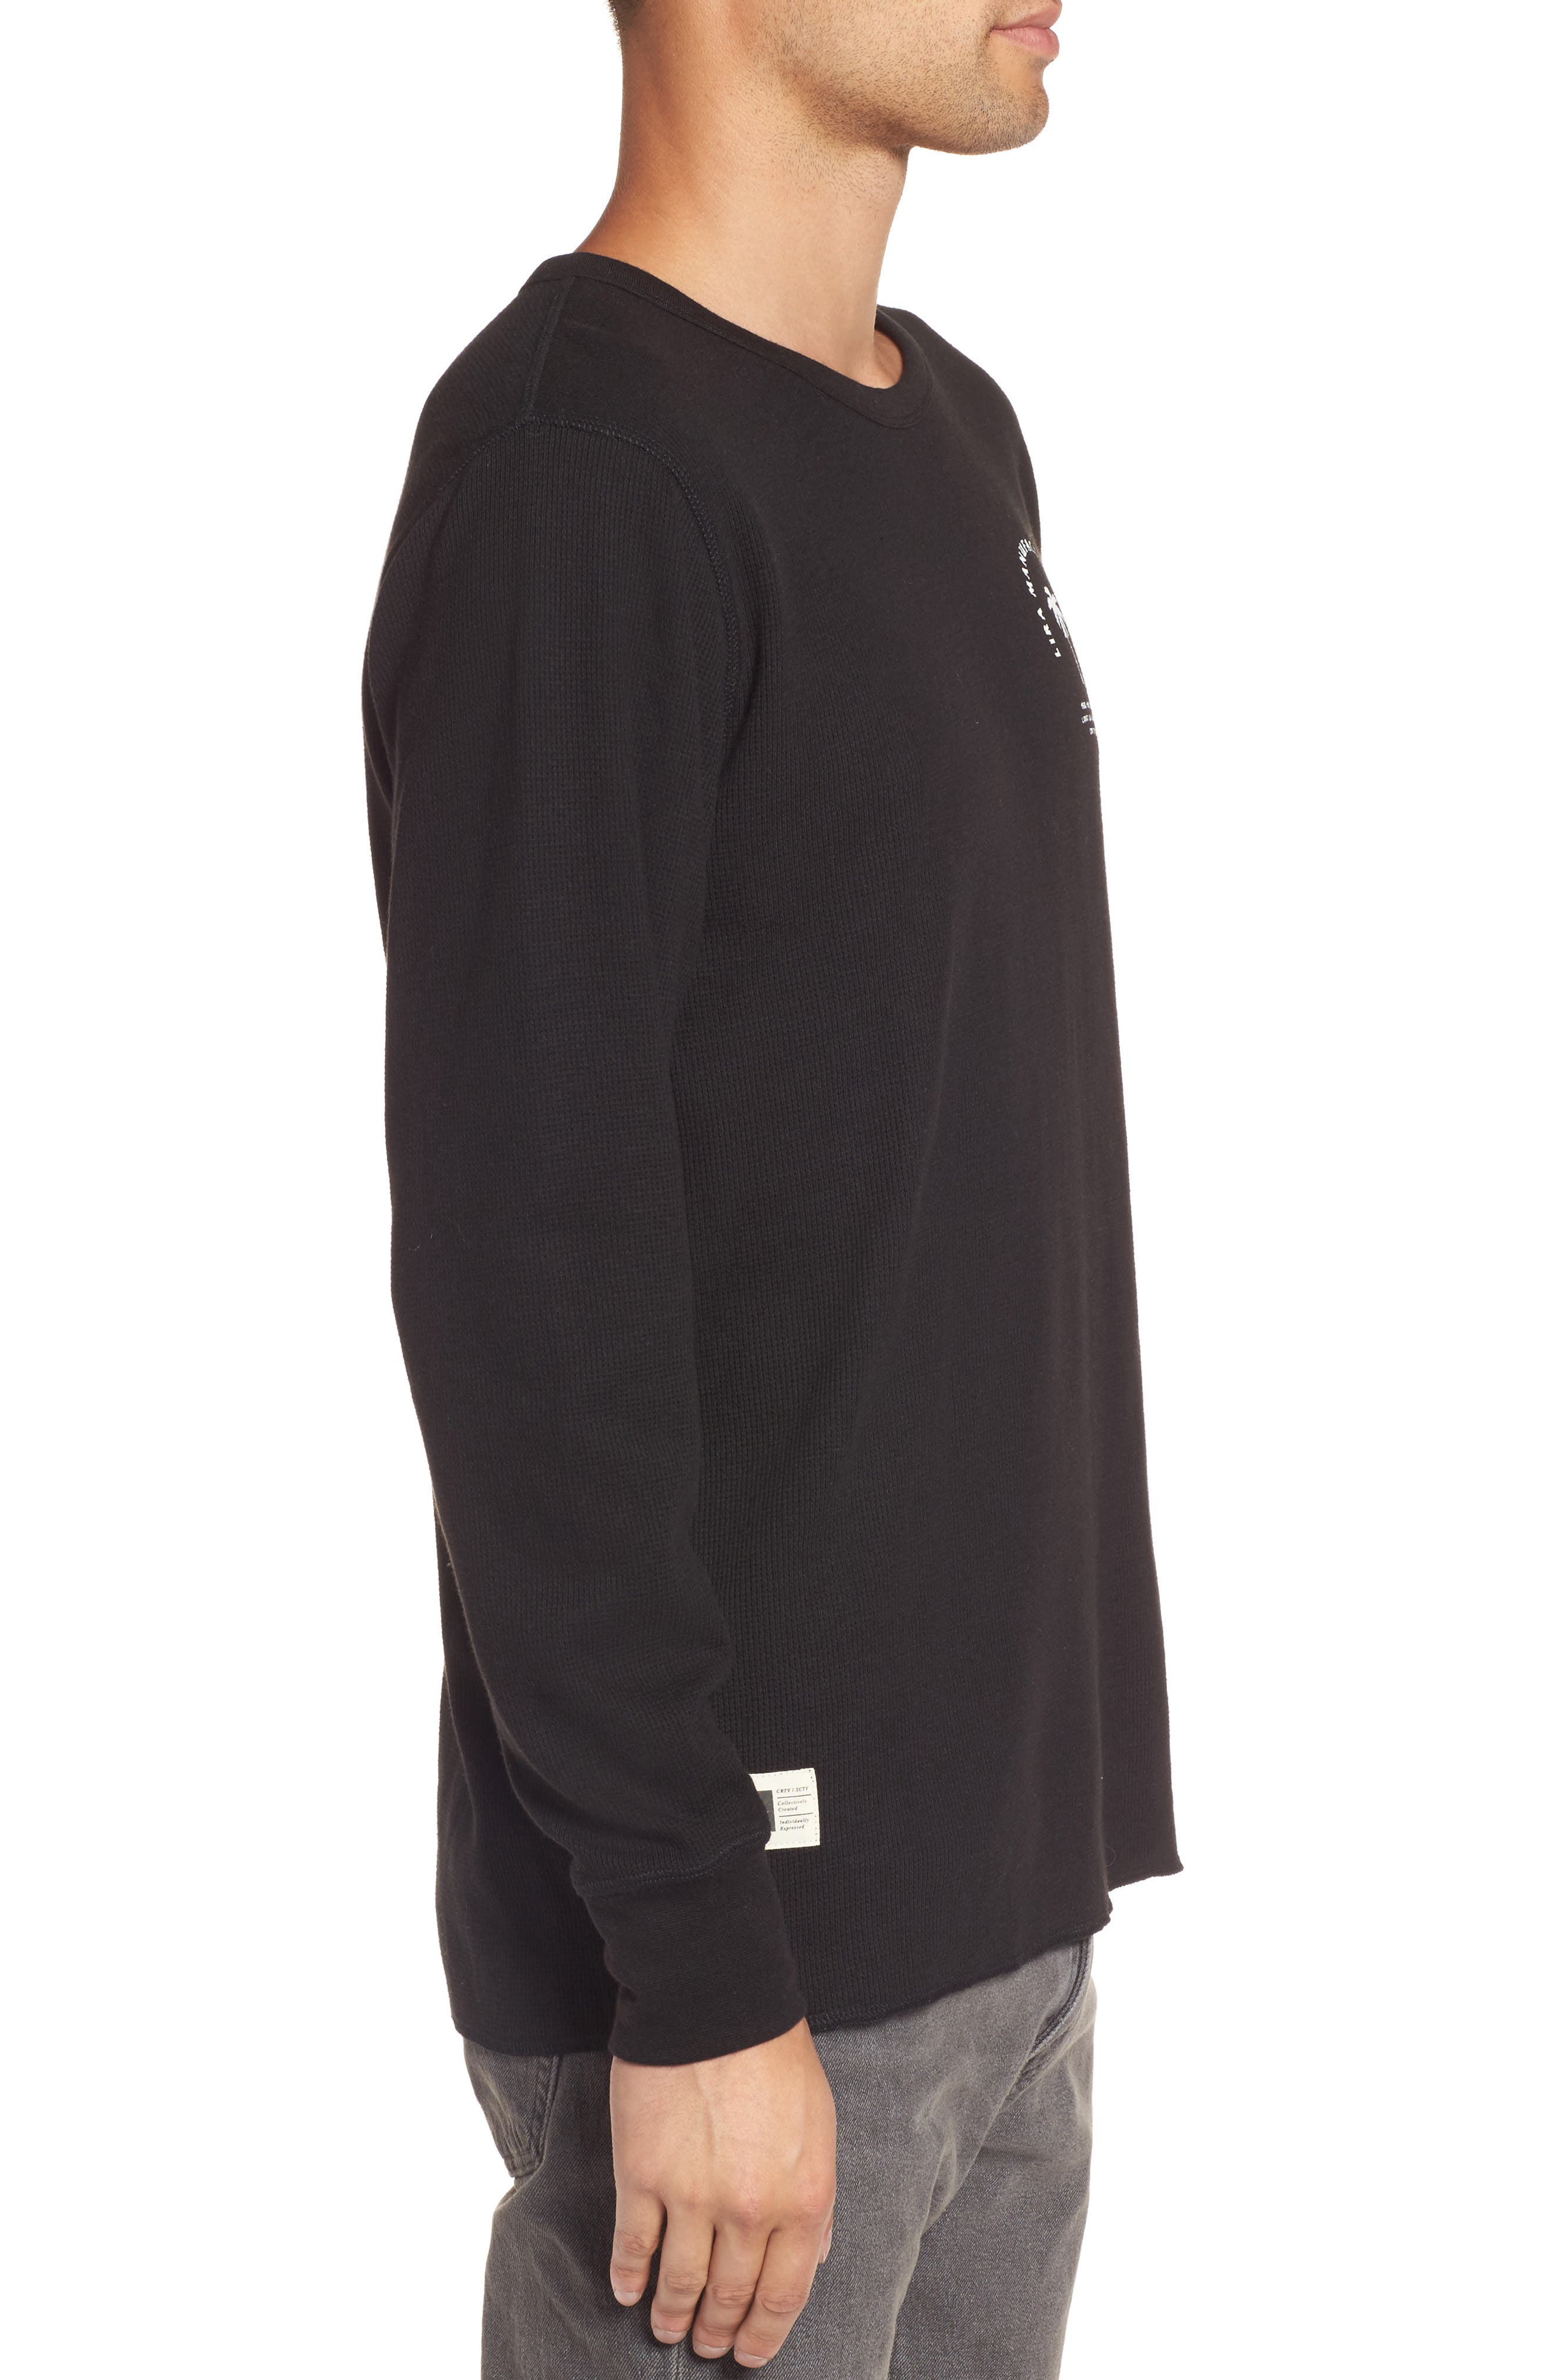 Alternate Image 3  - Lira Clothing Cochino Thermal T-shirt